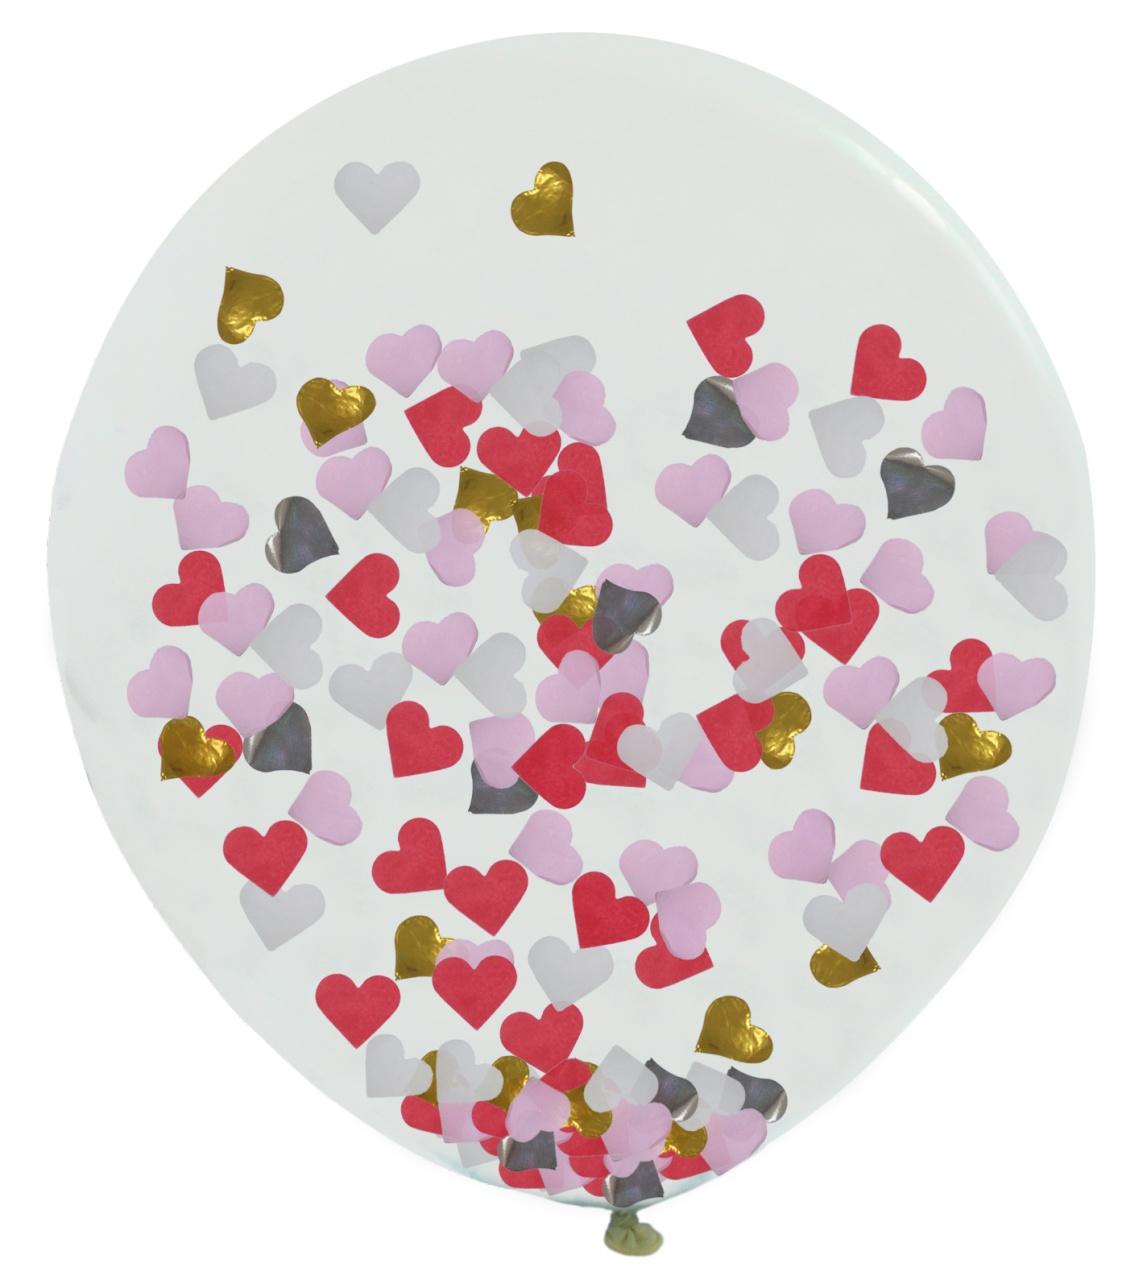 Ballon gefüllt mit Herzkonfetti rosa rot ca 180/200cm Umfang